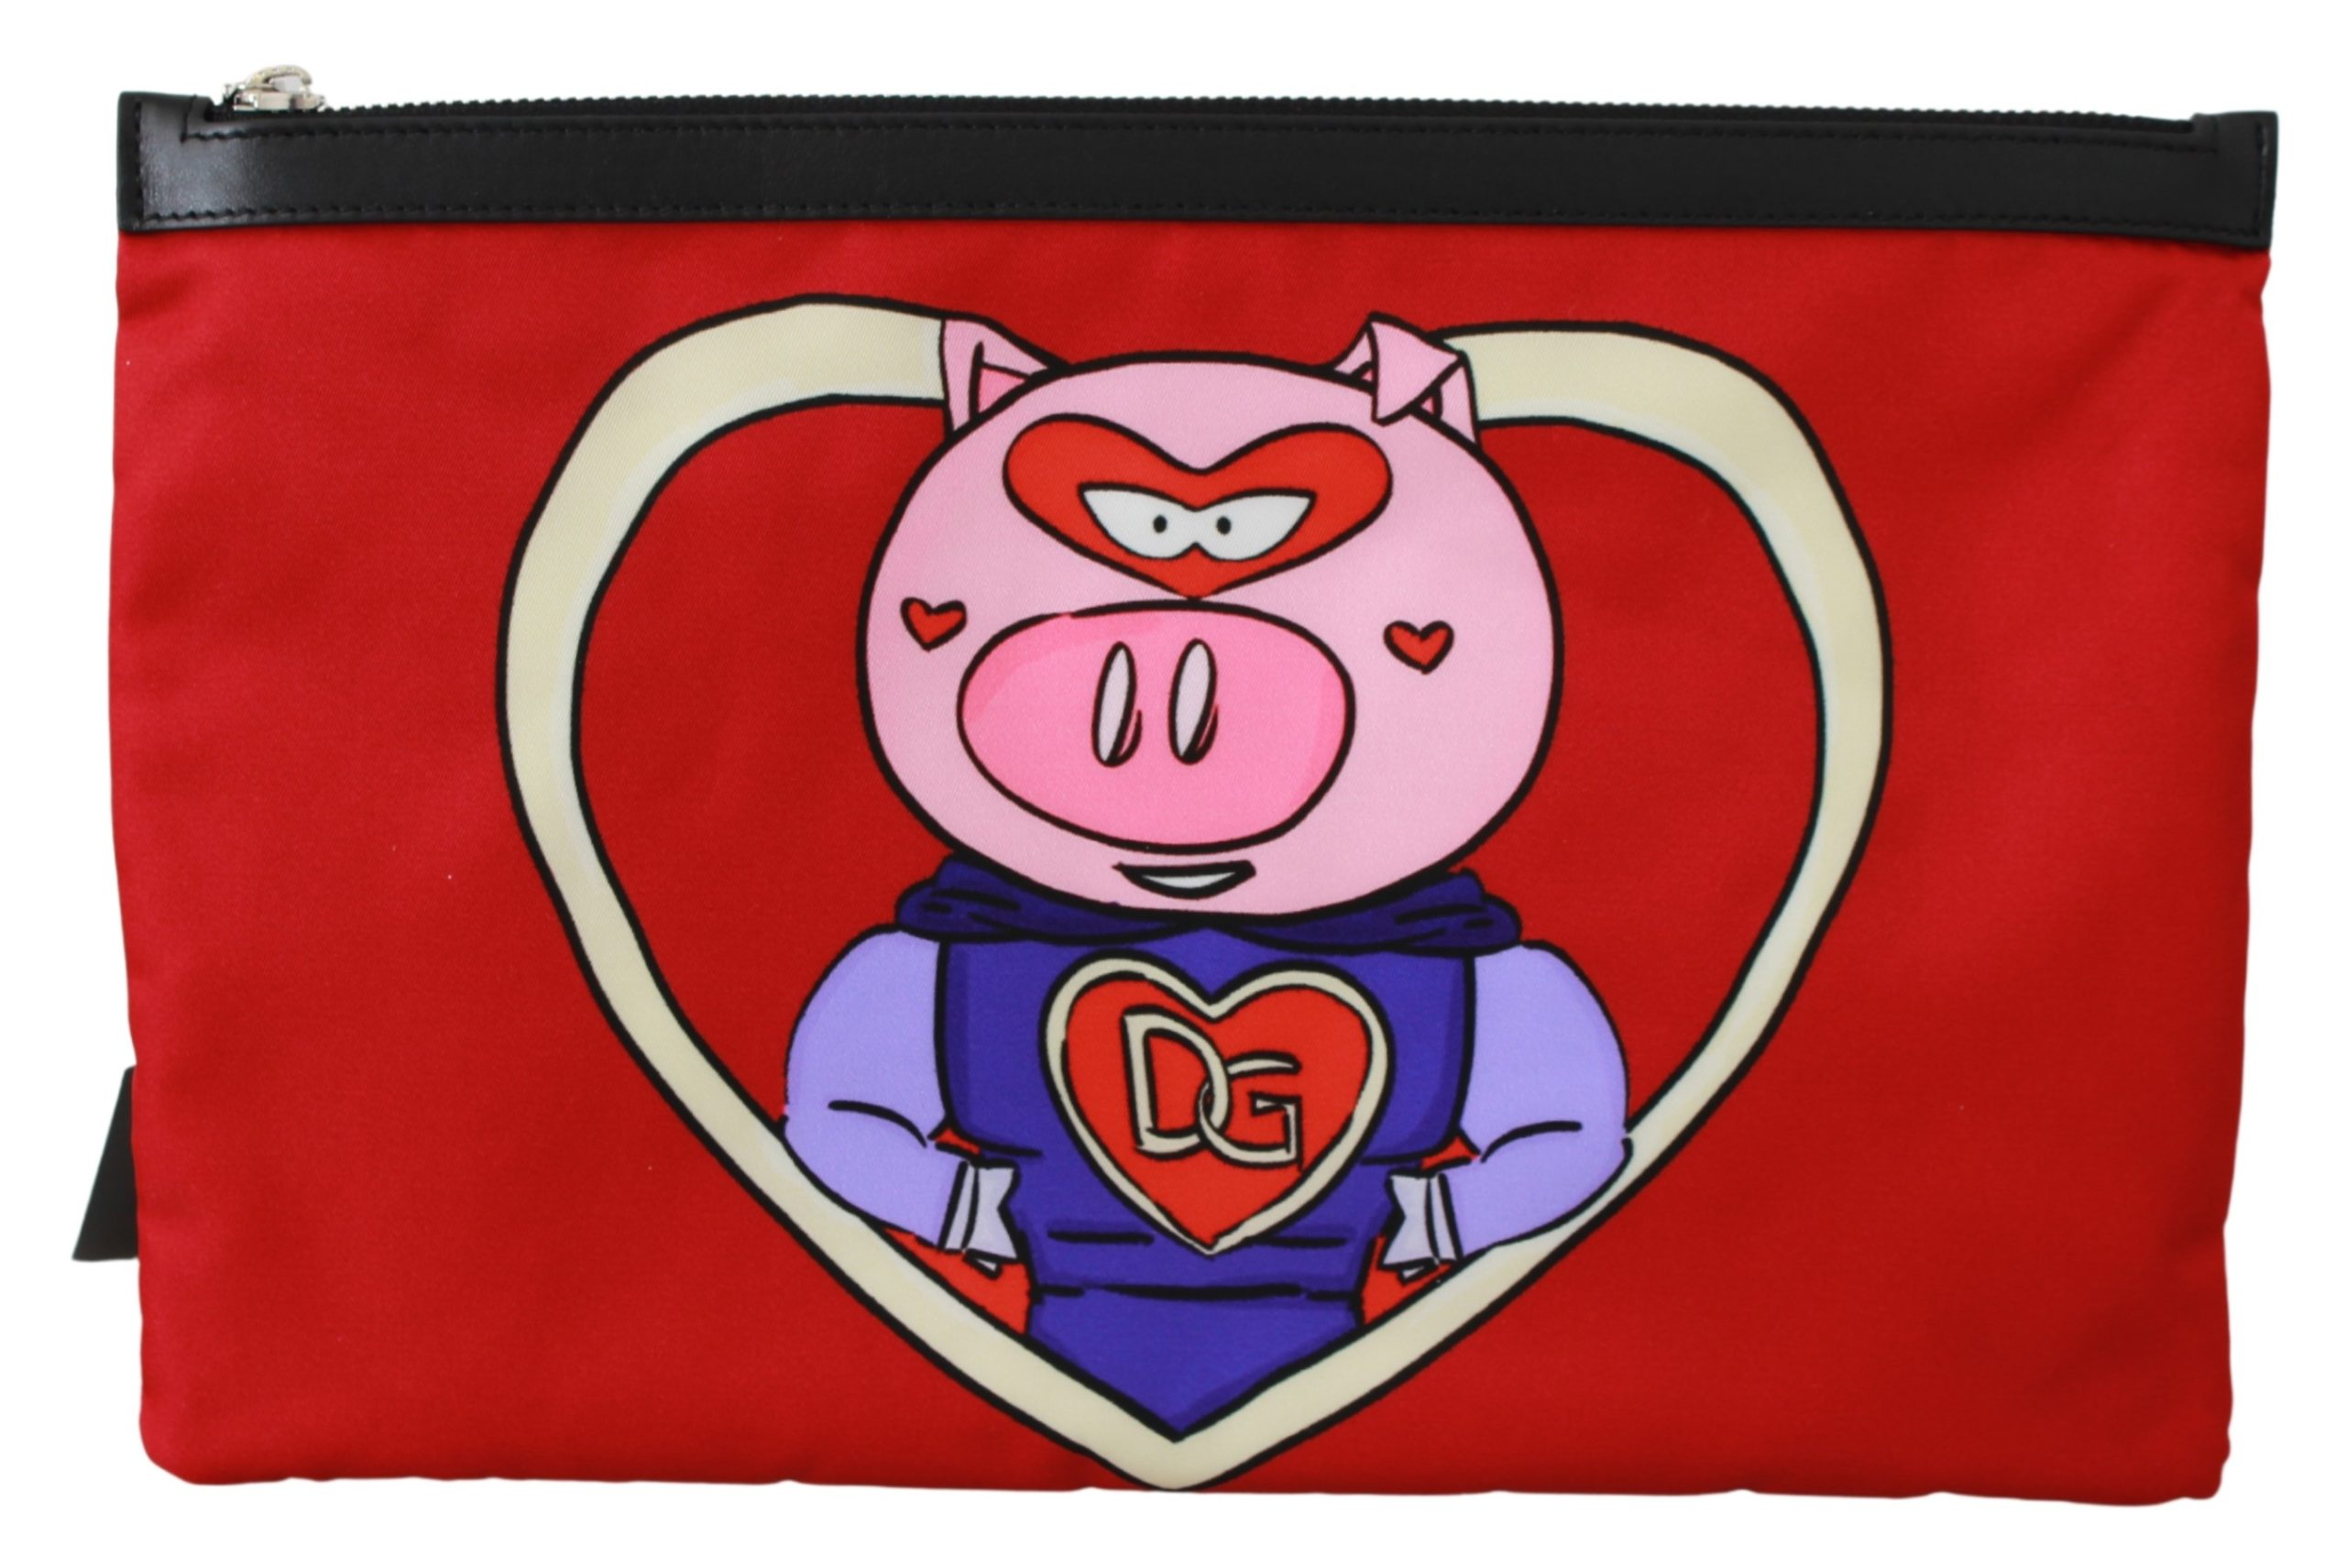 Dolce & Gabbana Men's Super Pig DG Love Print Hand Messenger Bag Red VAS9495